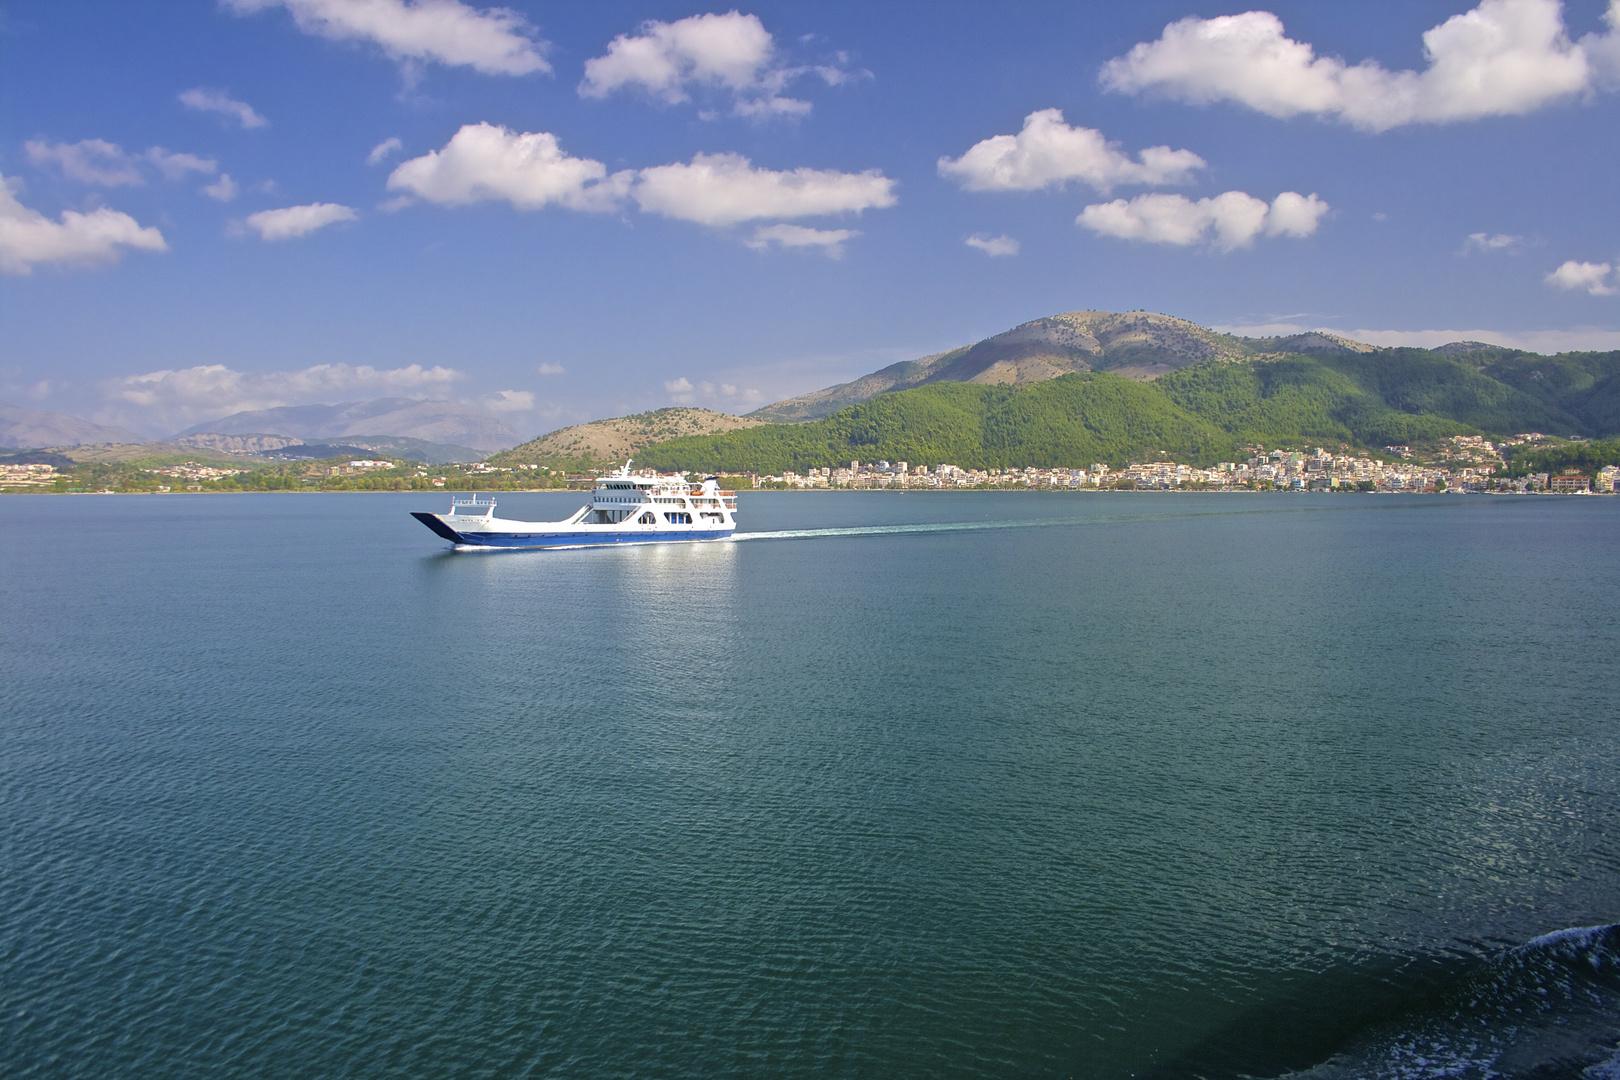 .......from Corfu to Igoumenitsa!